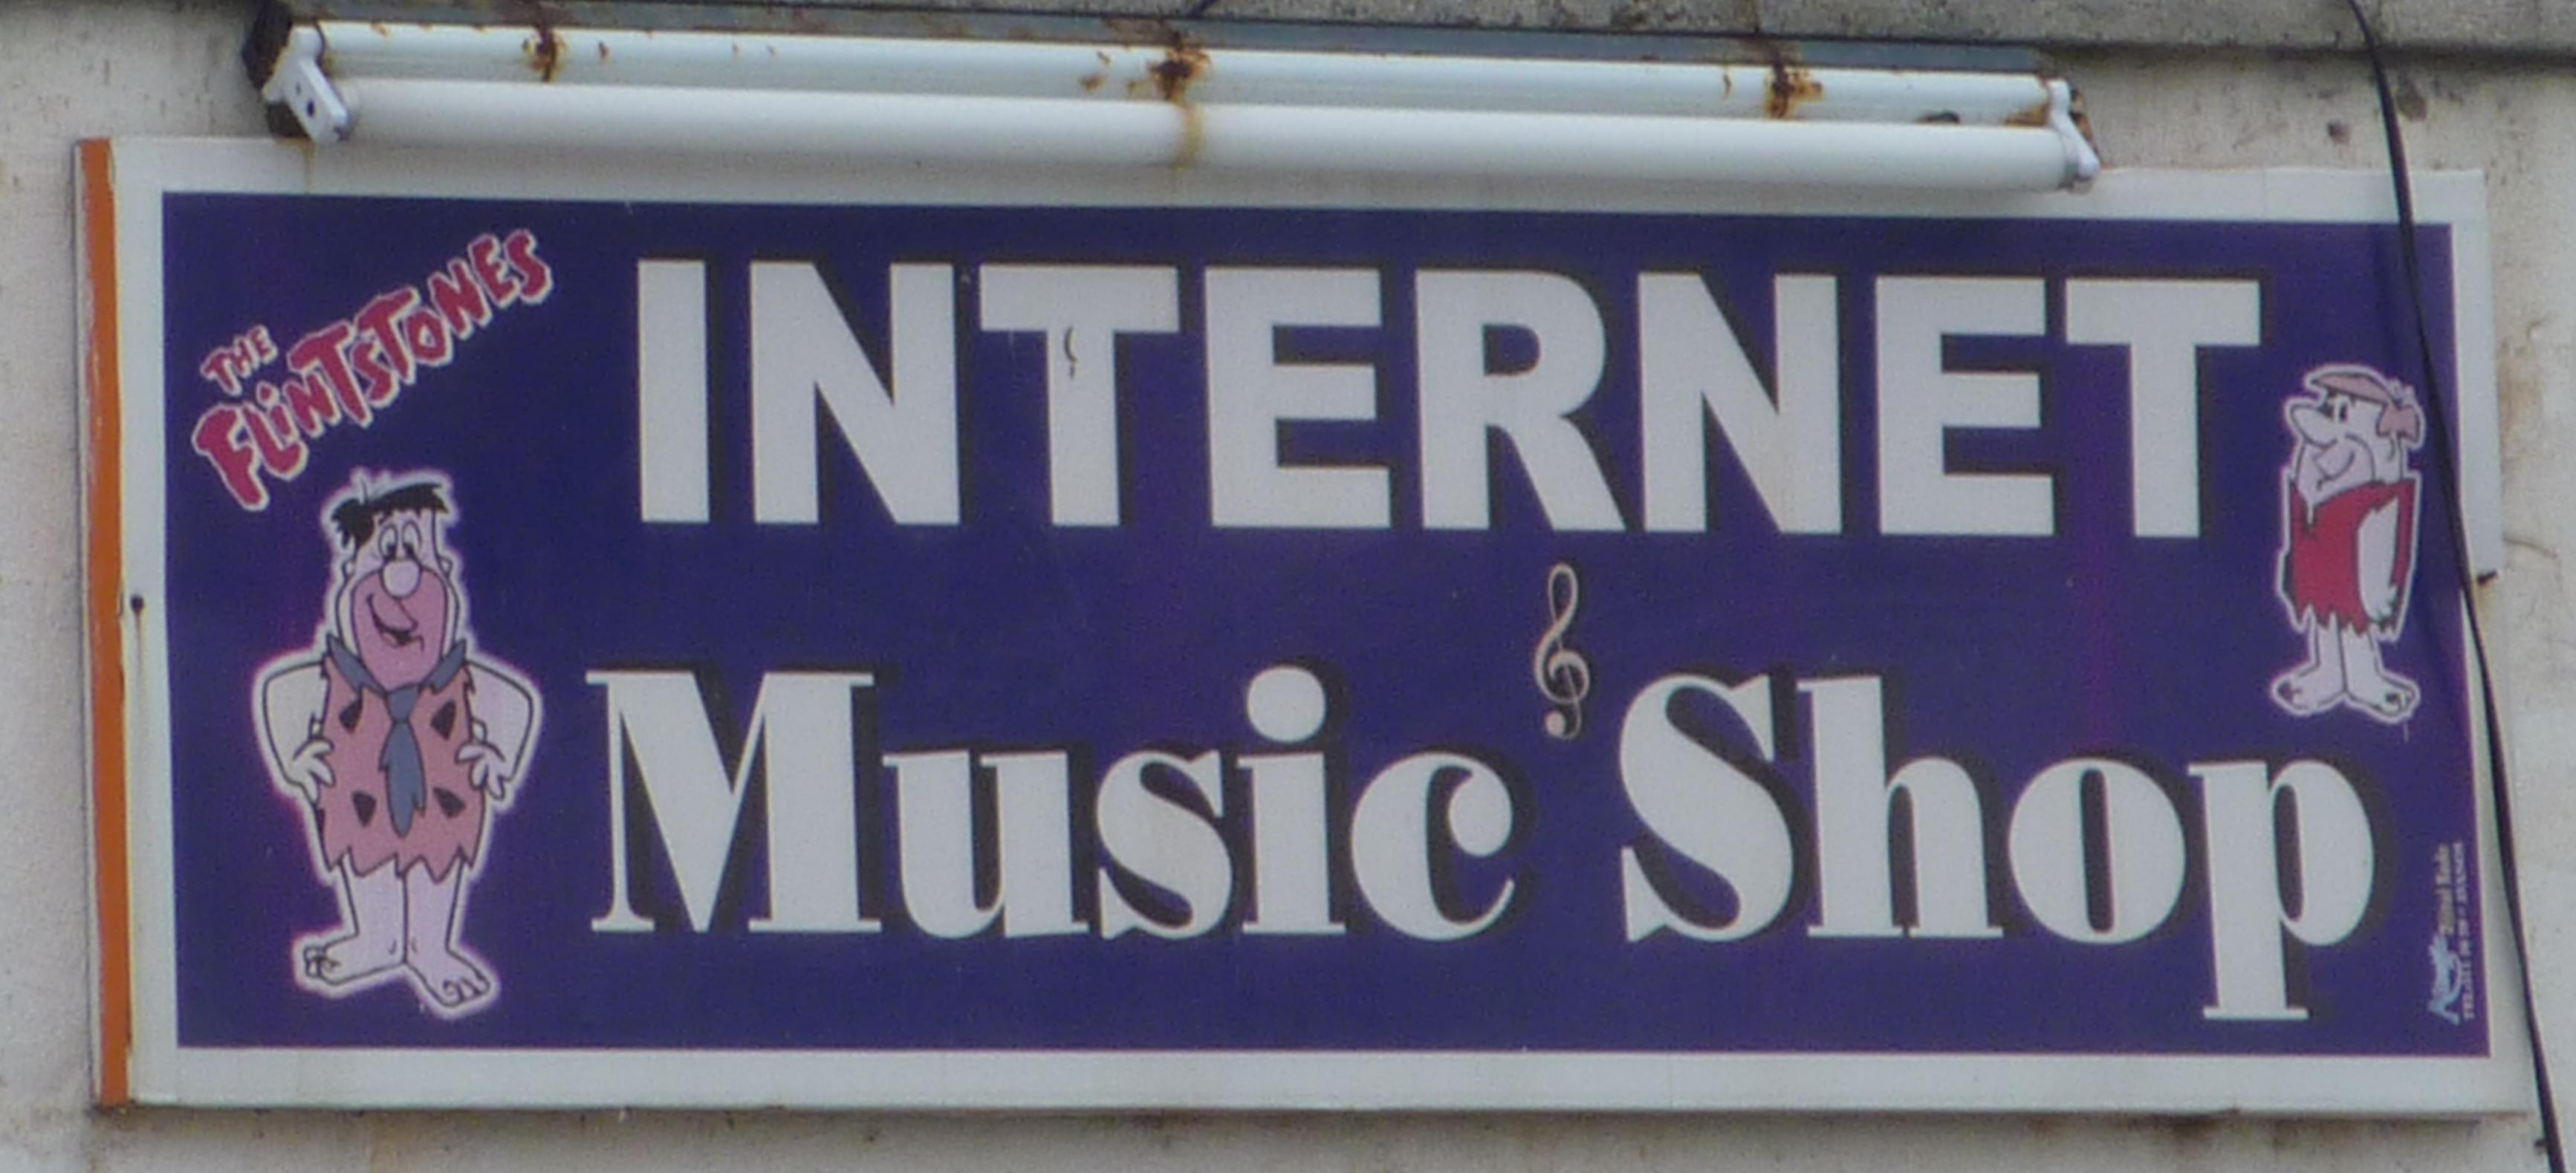 InternetFlintstones